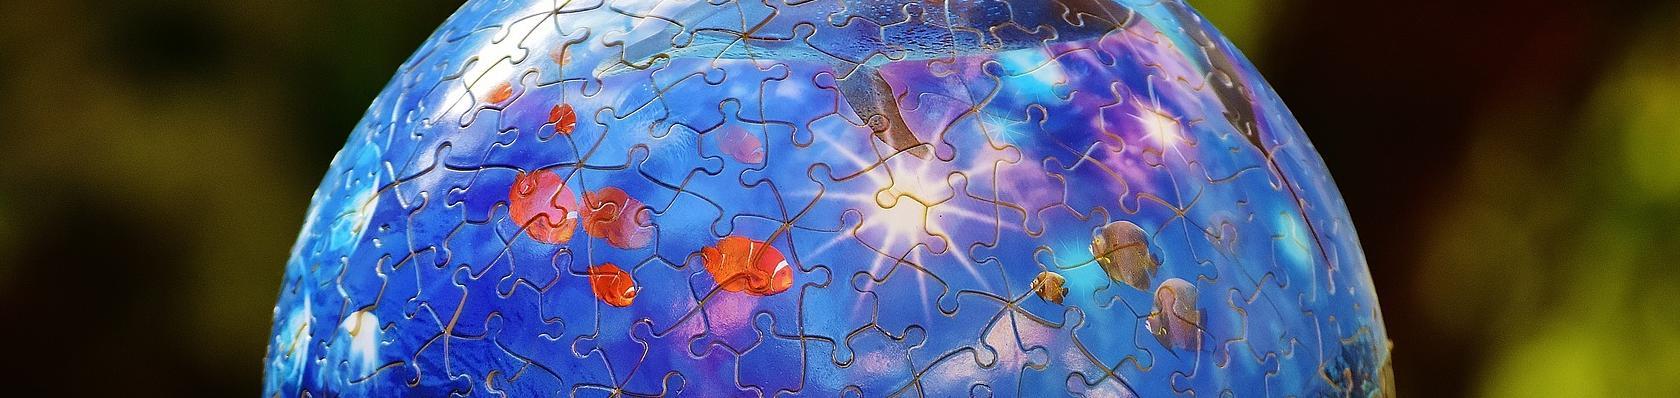 3D Puzzles im Test auf ExpertenTesten.de